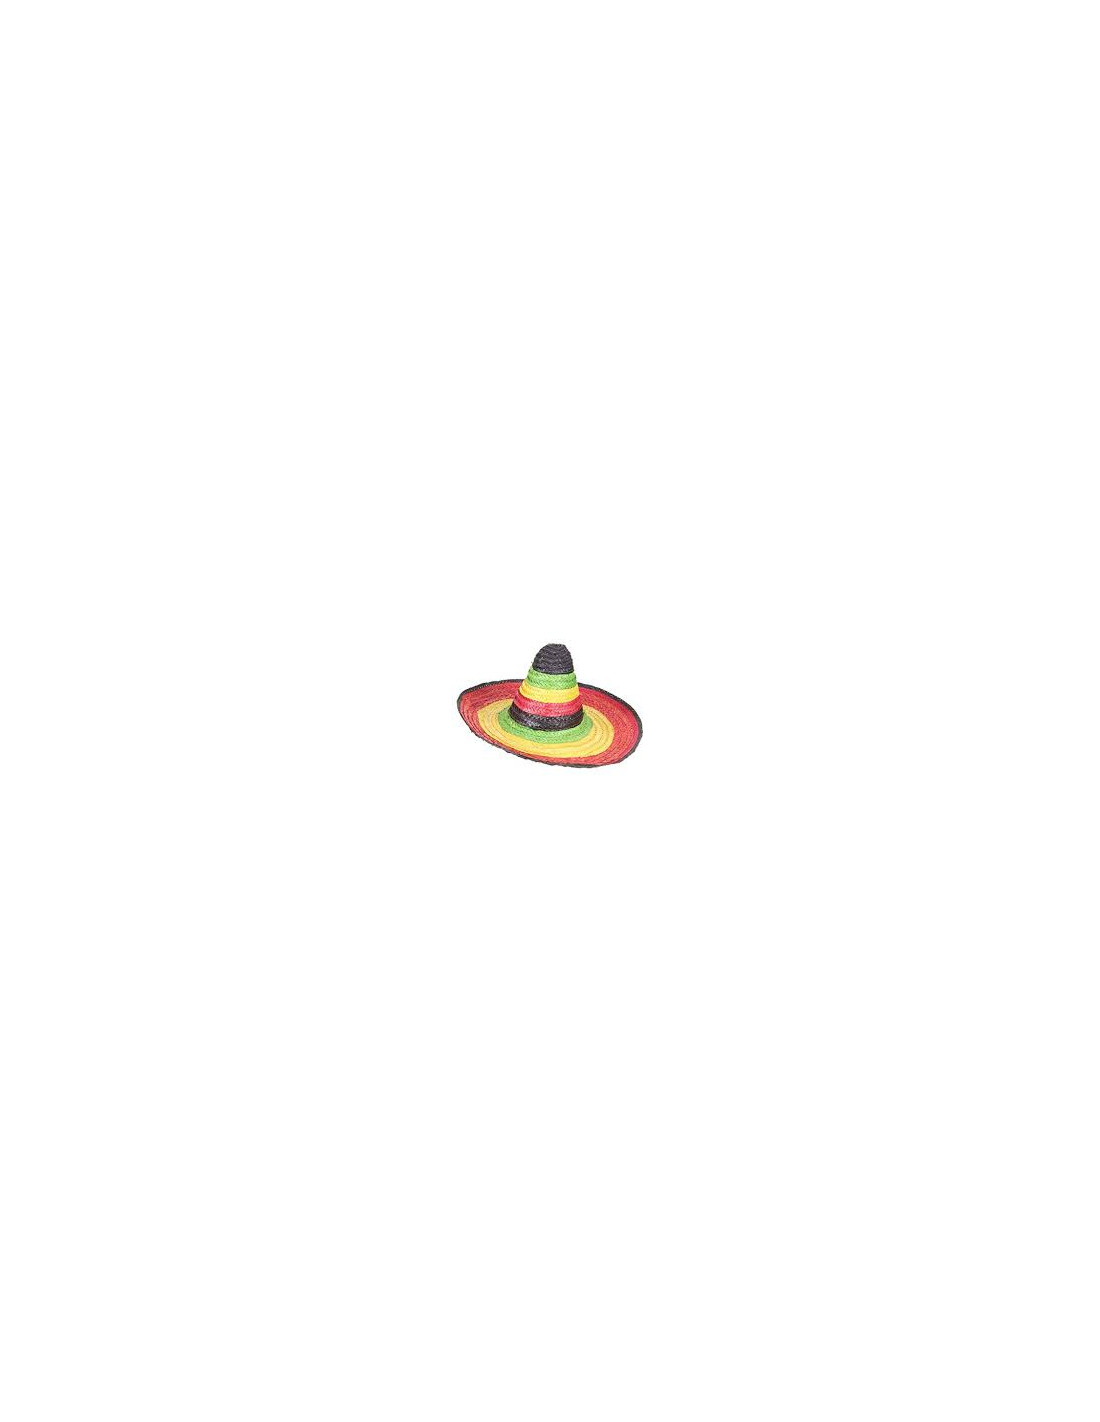 Sombrero Mexicain multicolore bordure et pointe noire adulte Cod.156084